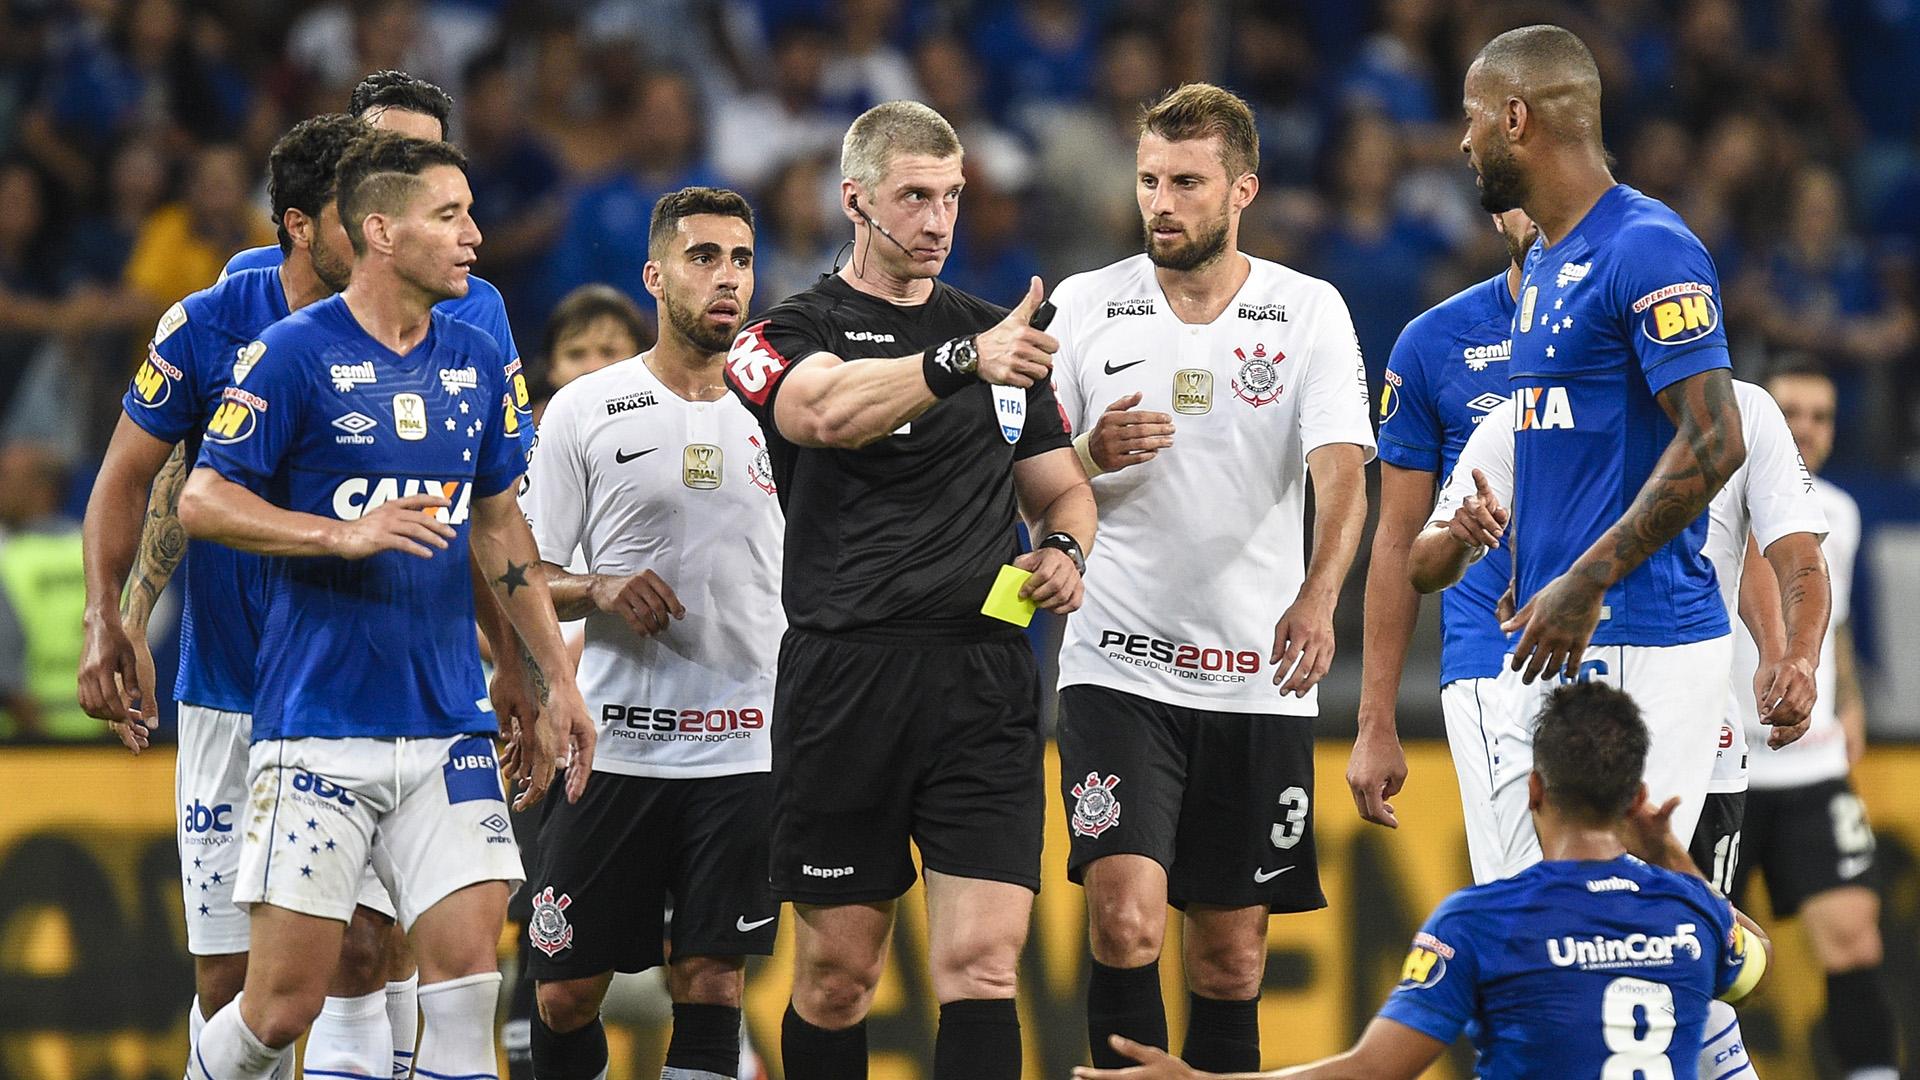 Anderson Daronco Cruzeiro Corinthians Copa do Brasil final 10102018